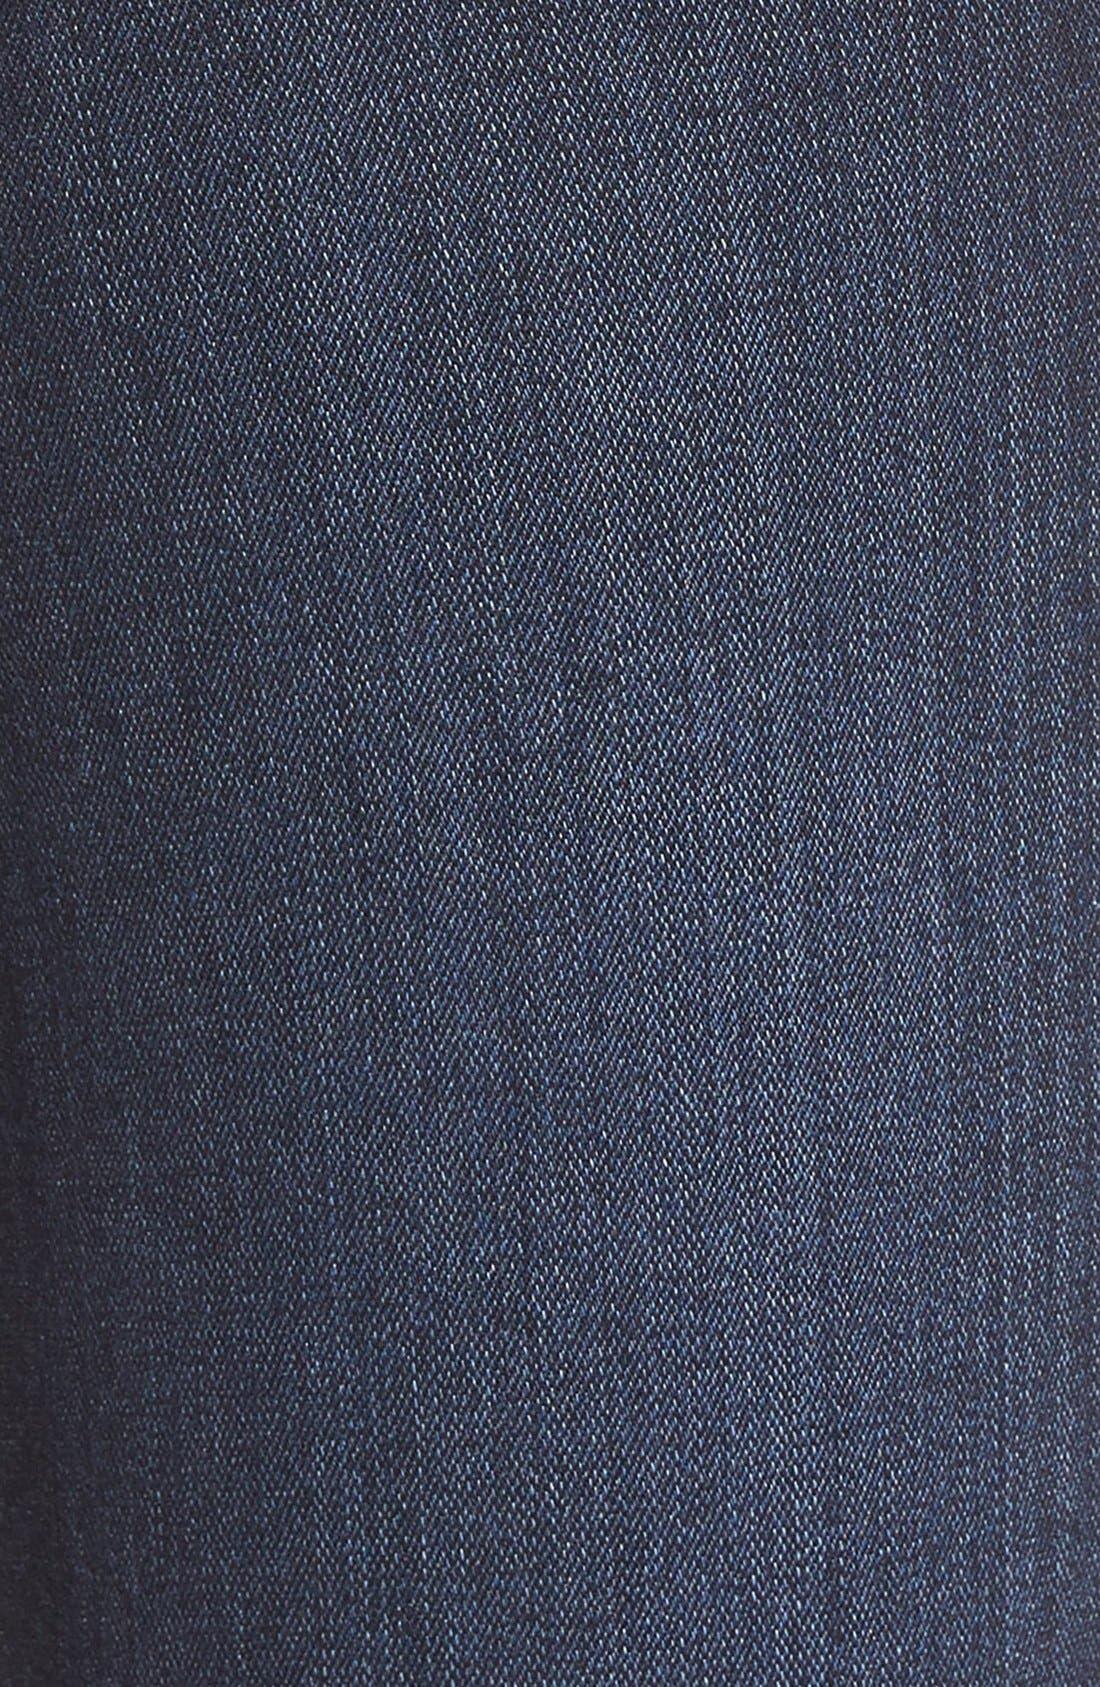 Alternate Image 6  - PAIGE 'Transcend - Verdugo' Ankle Ultra Skinny Jeans (Hartmann) (Nordstrom Exclusive)